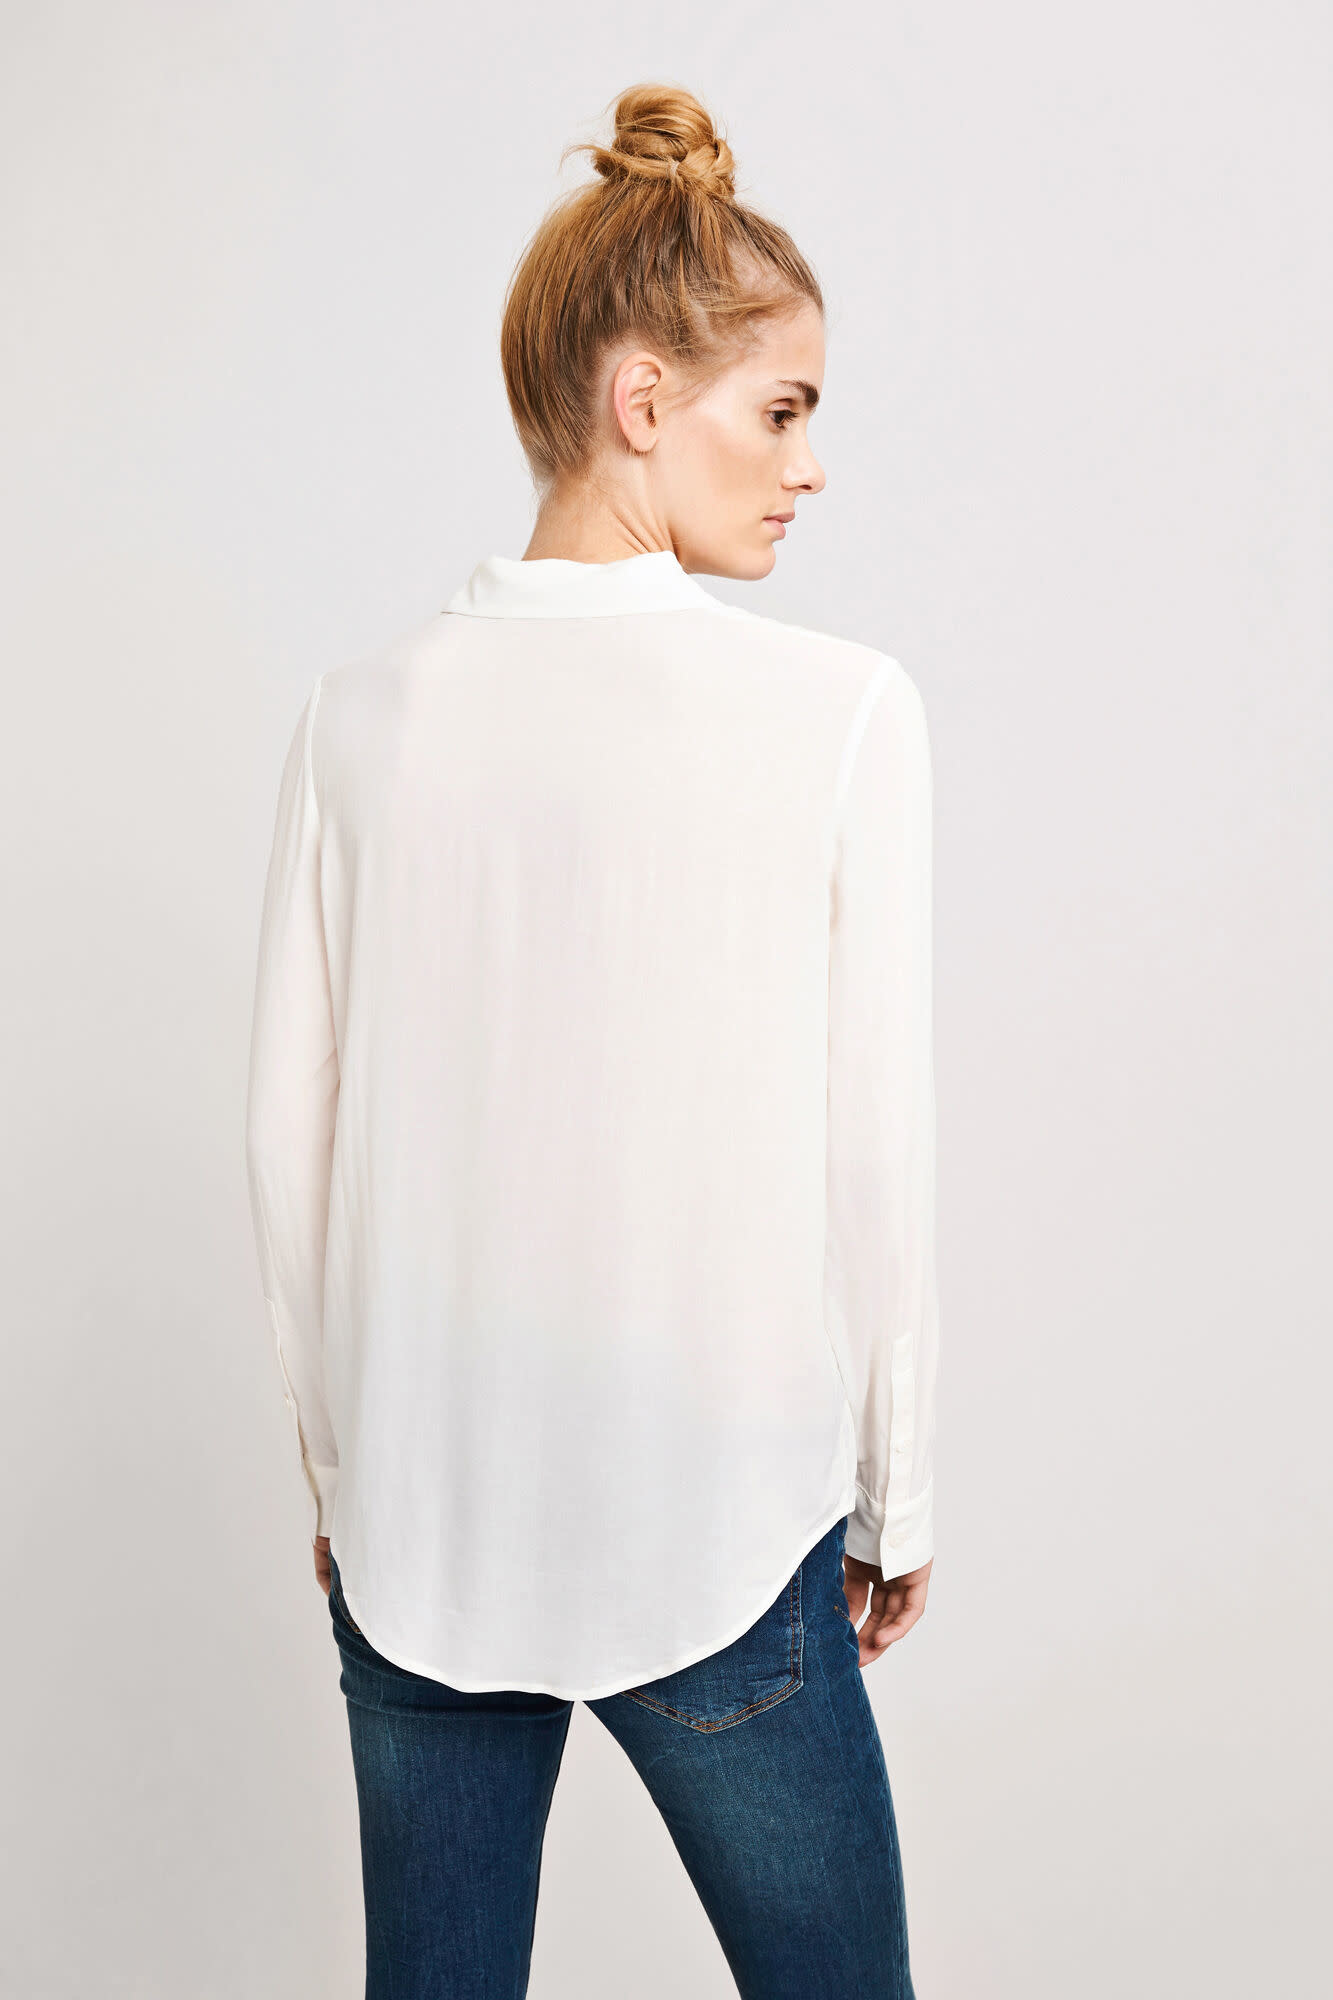 milly np shirt samsoe samsoe-4